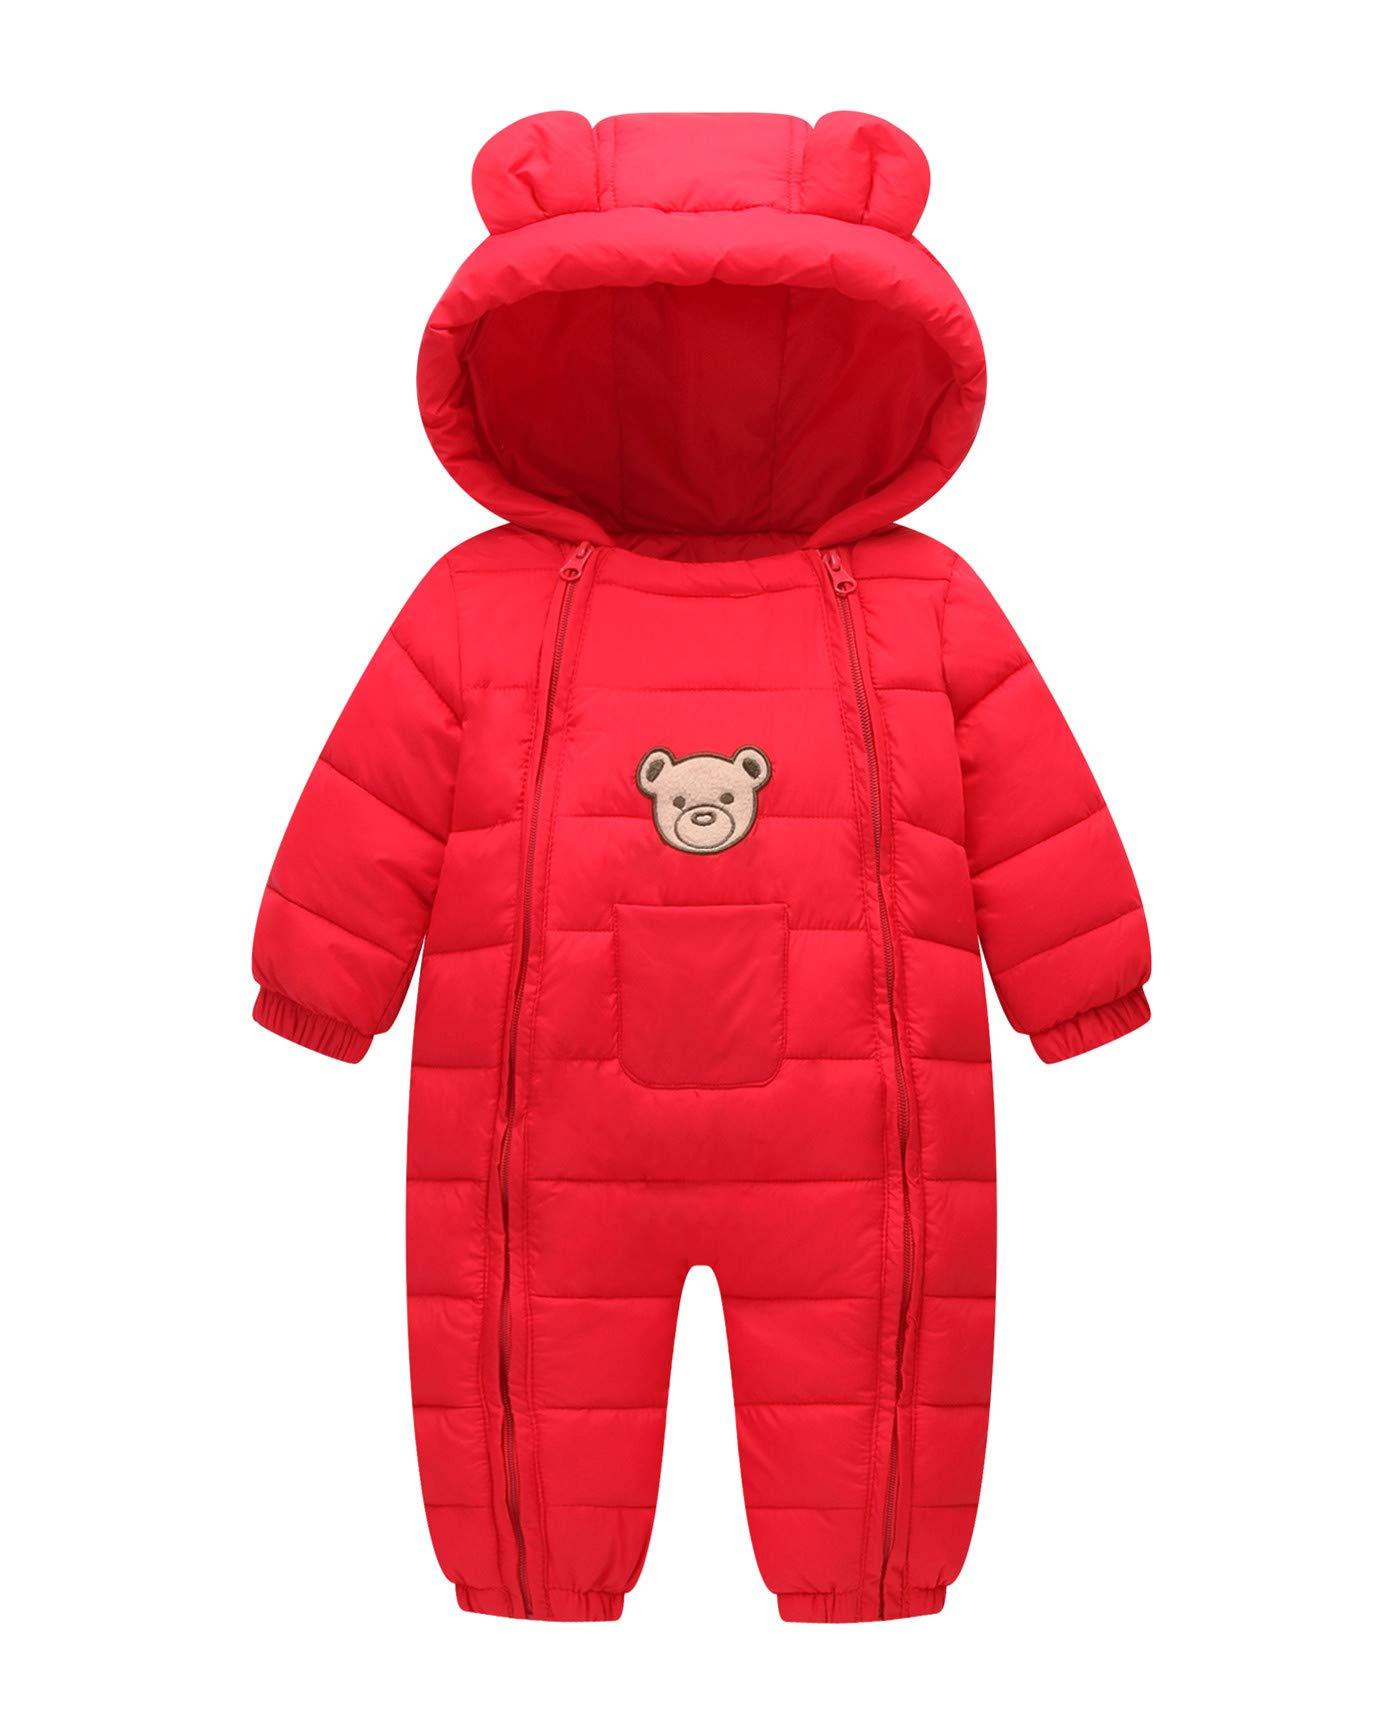 Baby Cotton Snowsuit Windproof Winter Romper Toddler Cute Bear Zipper Jumpsuit Red 100 by Xuvozta